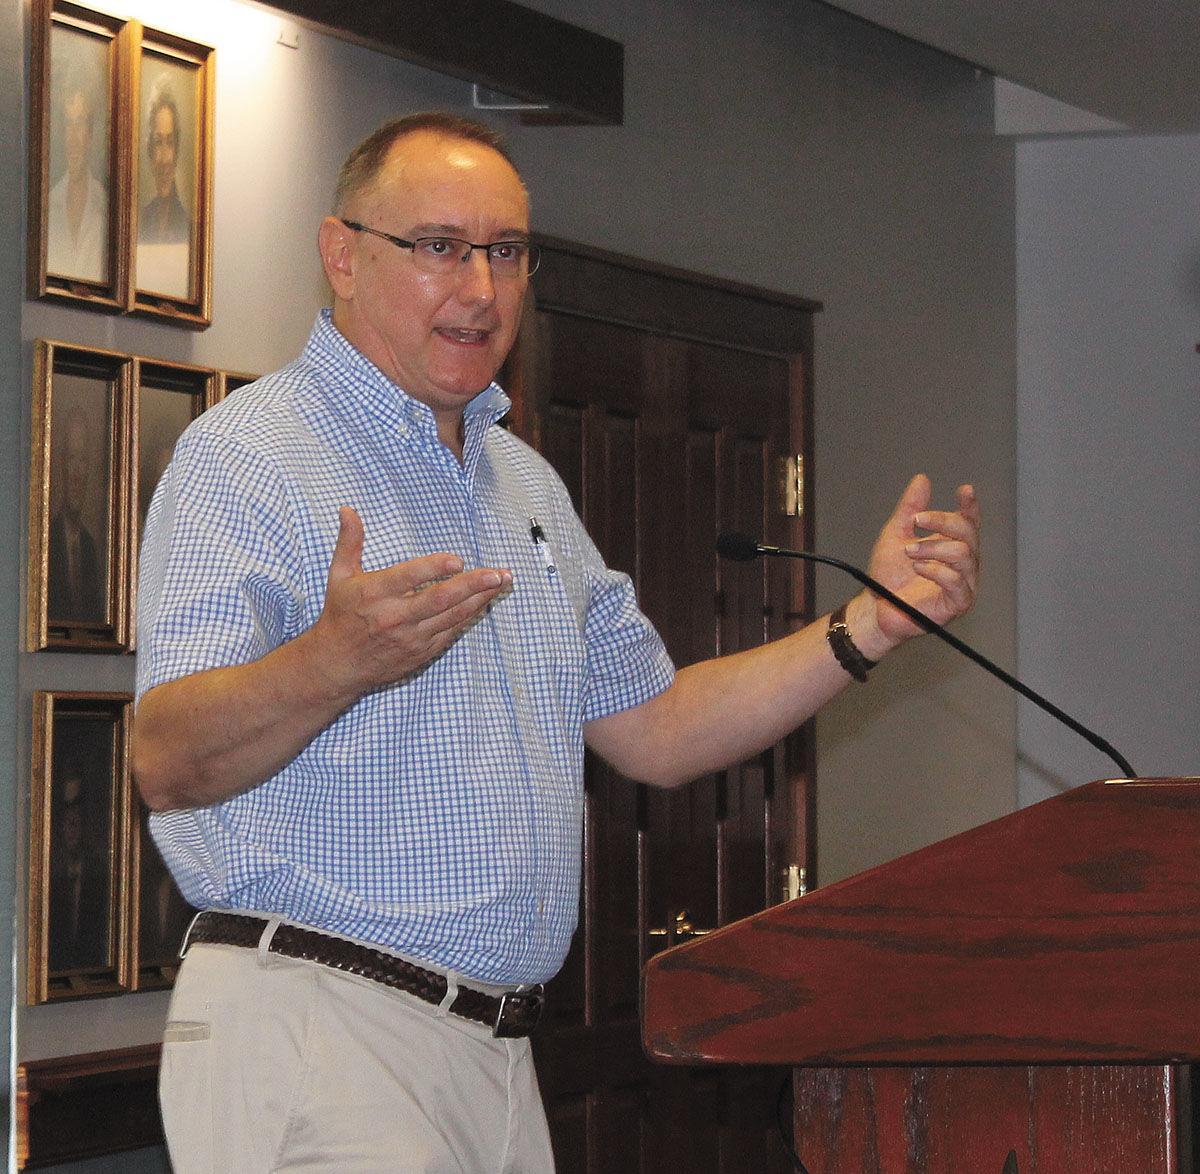 Teachers get taste of Morristown industries with externship